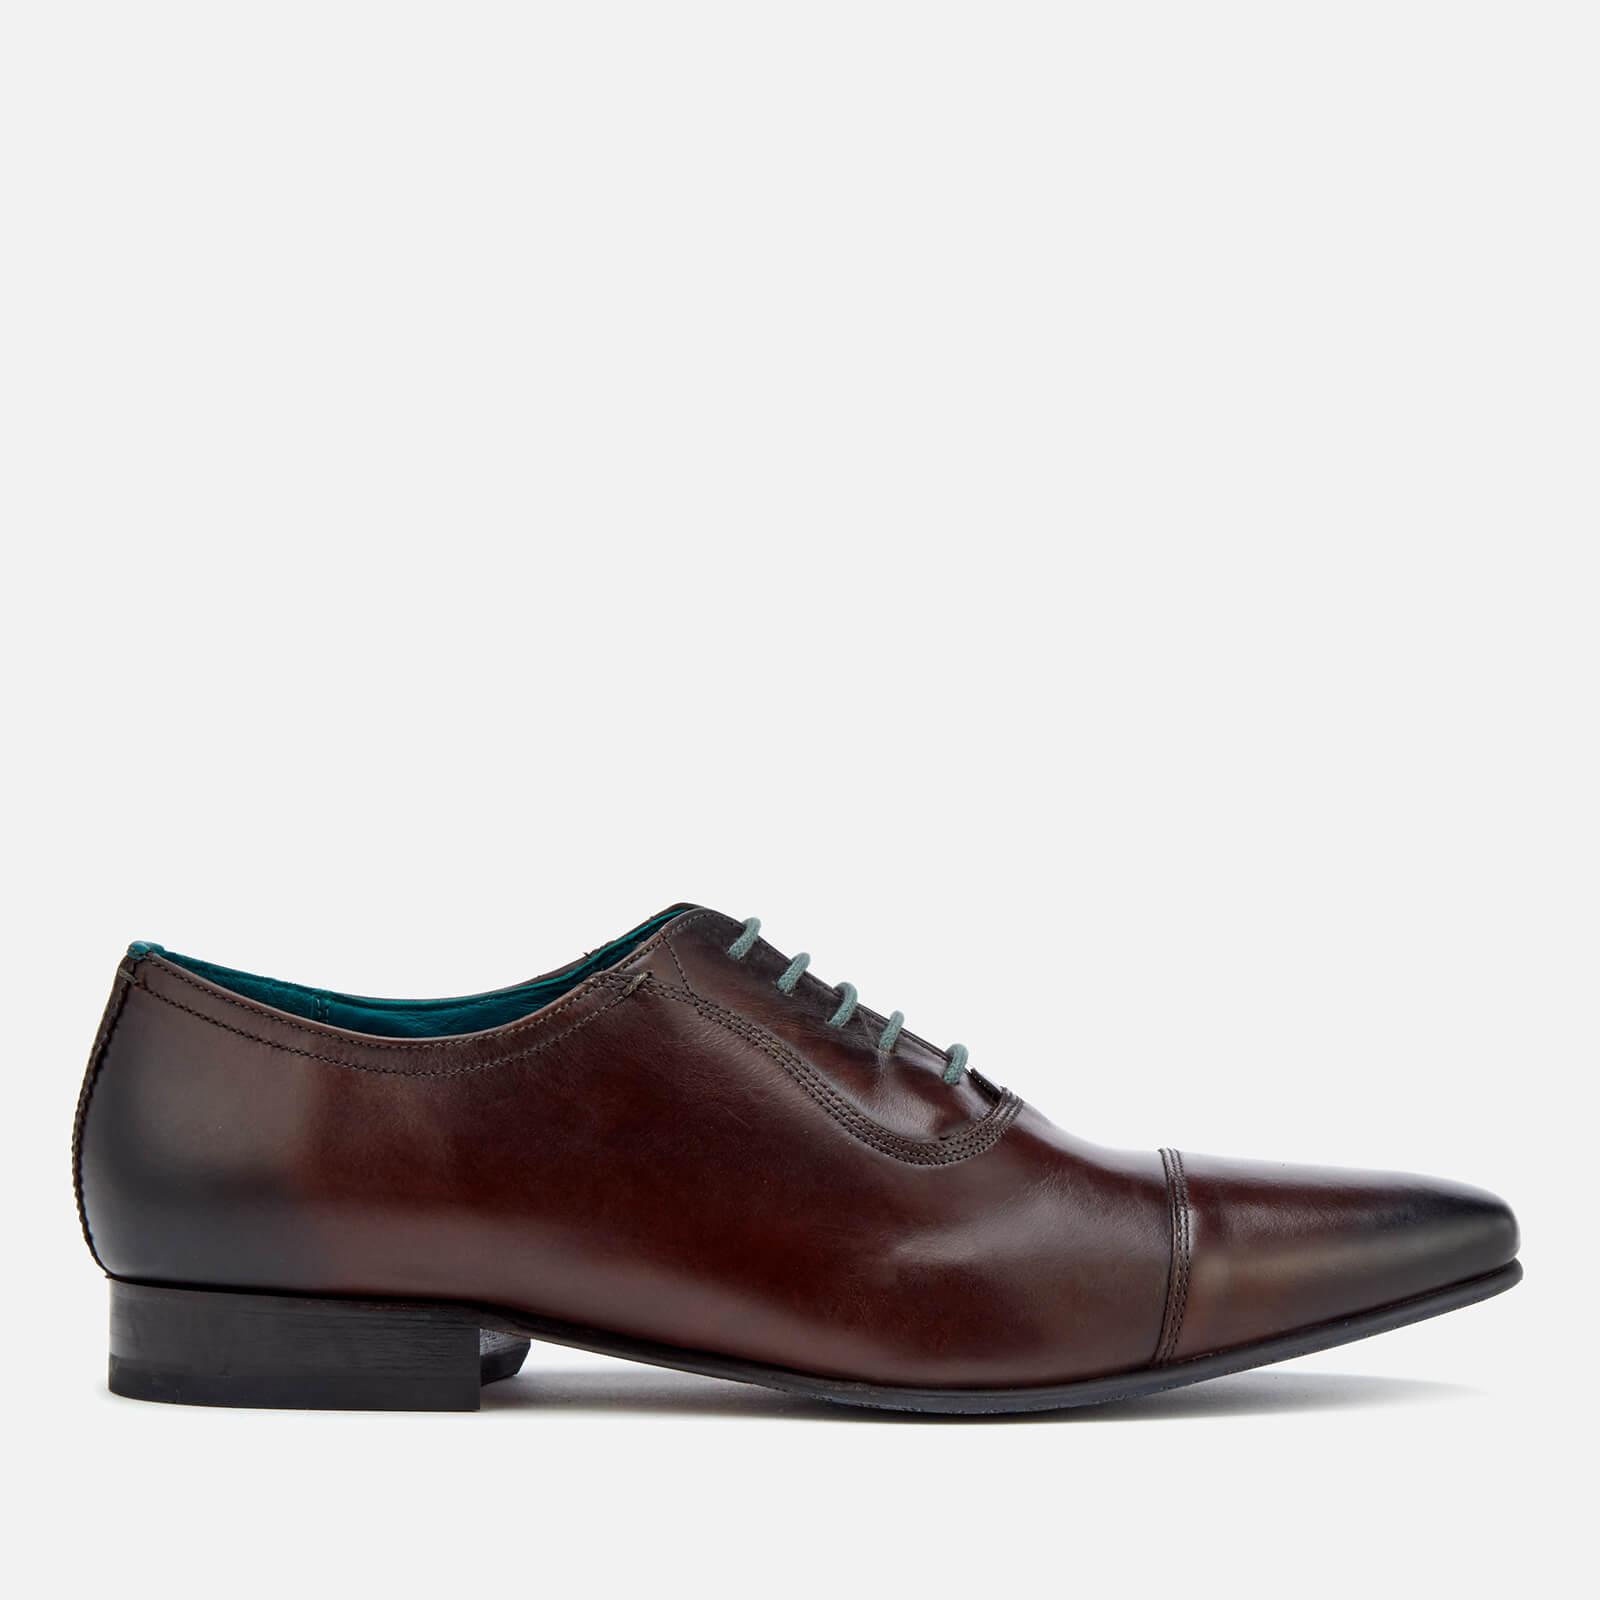 Ted Baker Men's Karney Leather Toe-Cap Oxford Shoes - Brown - UK 9